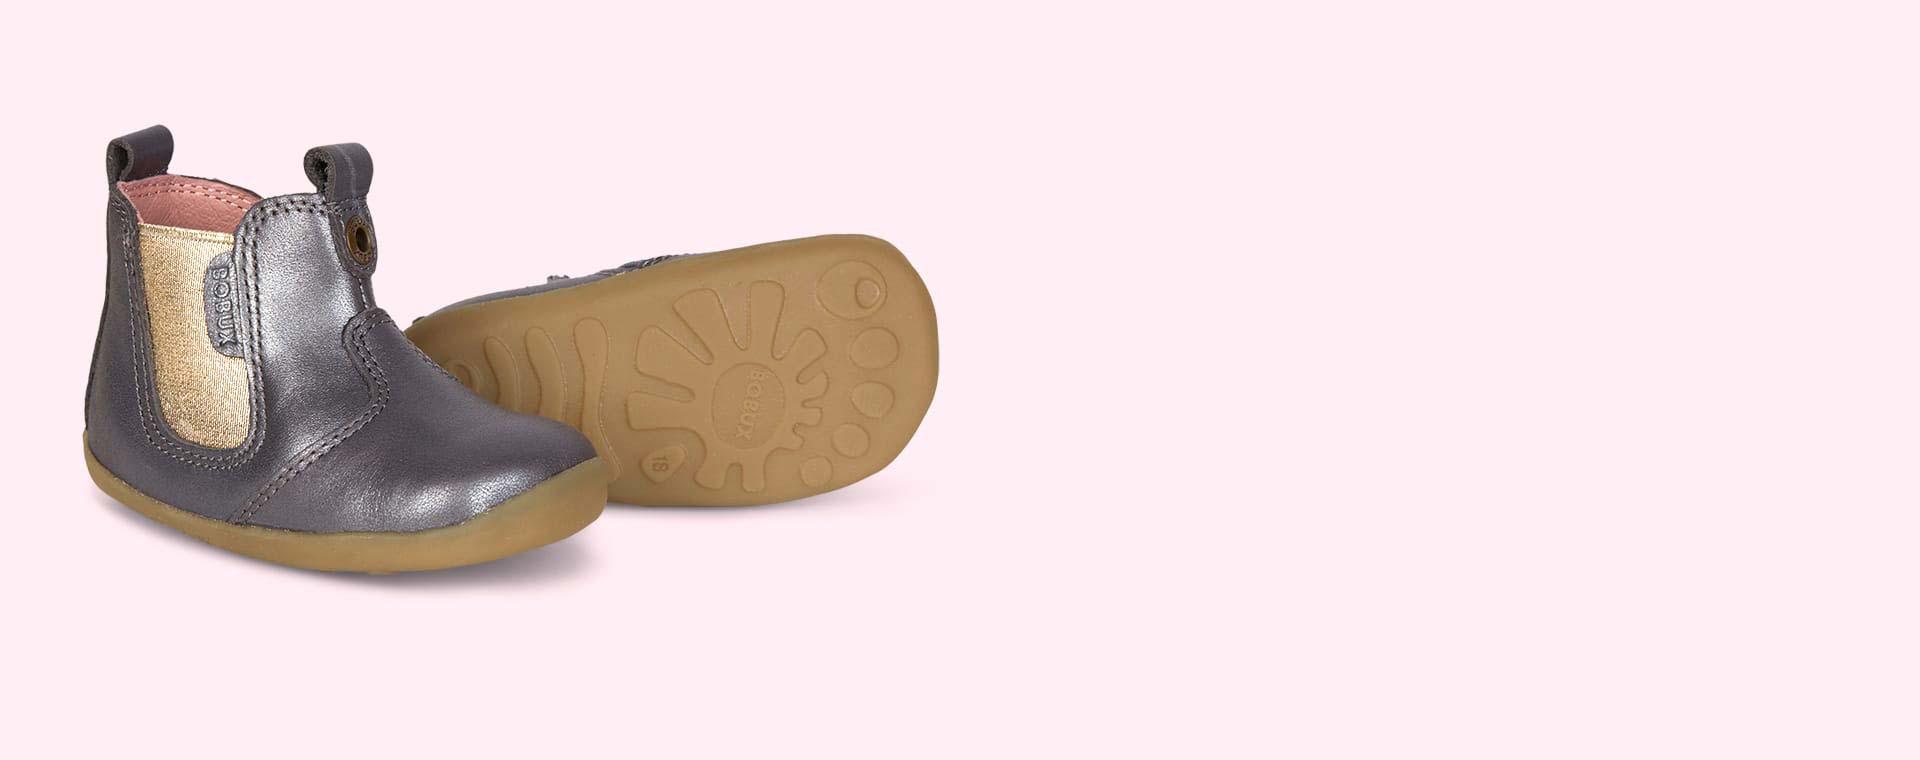 Charcoal Bobux Jodphur Step-Up Boot